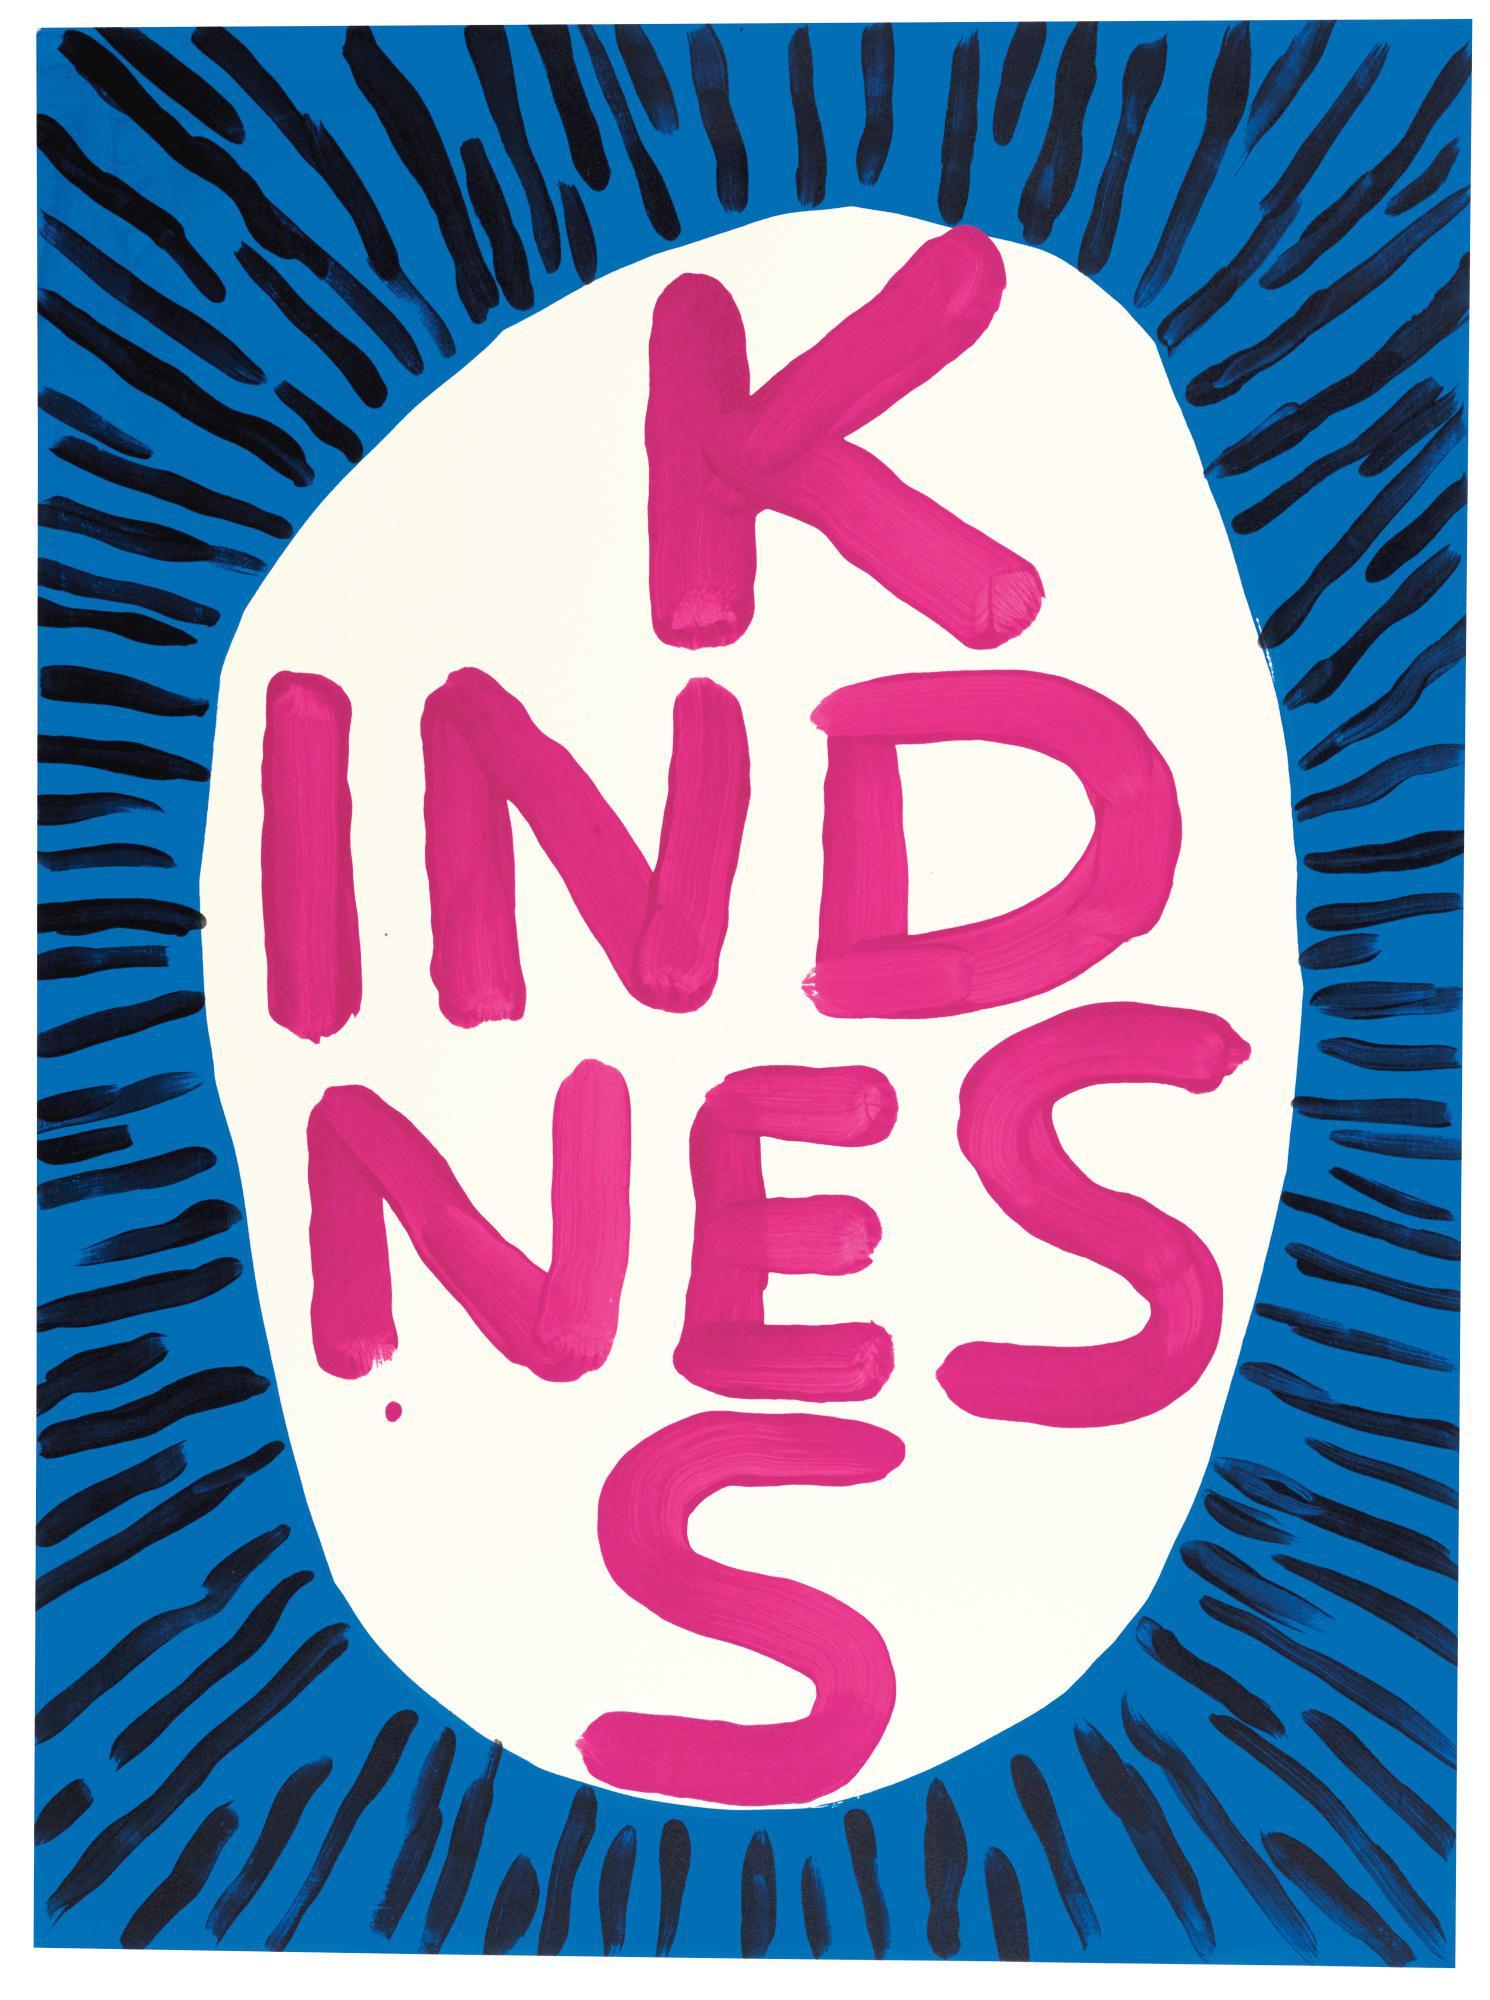 DAVID SHRIGLEY | KINDNESS